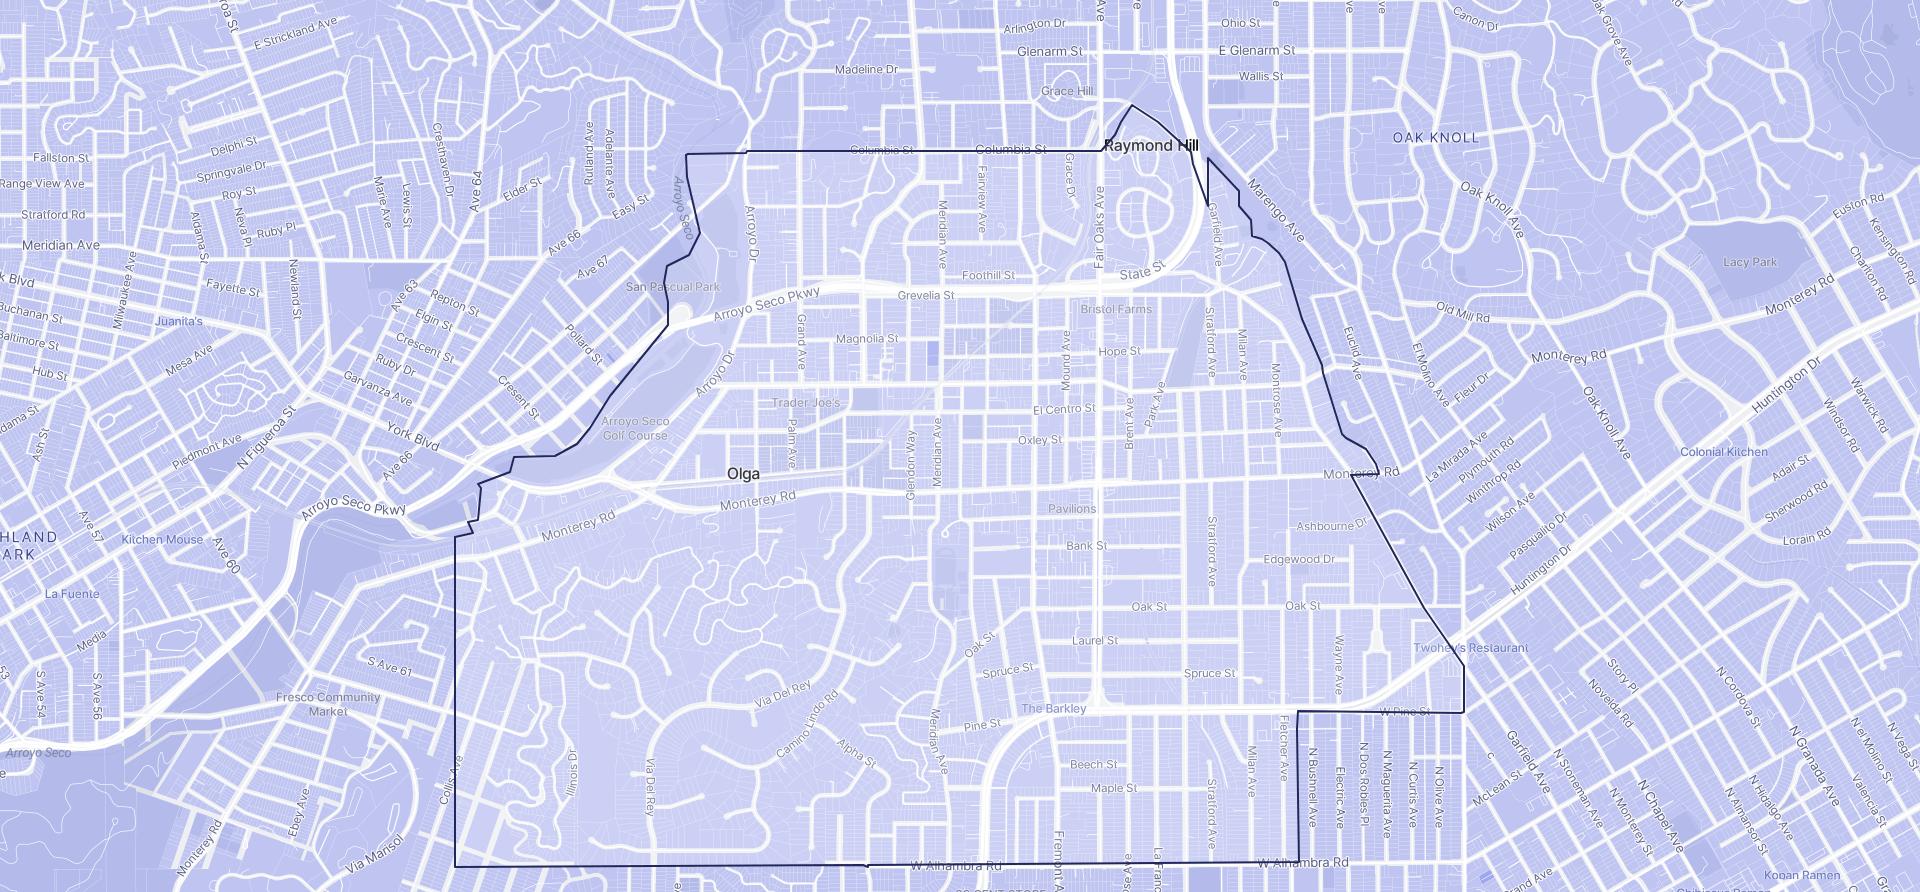 Image of South Pasadena boundaries on a map.